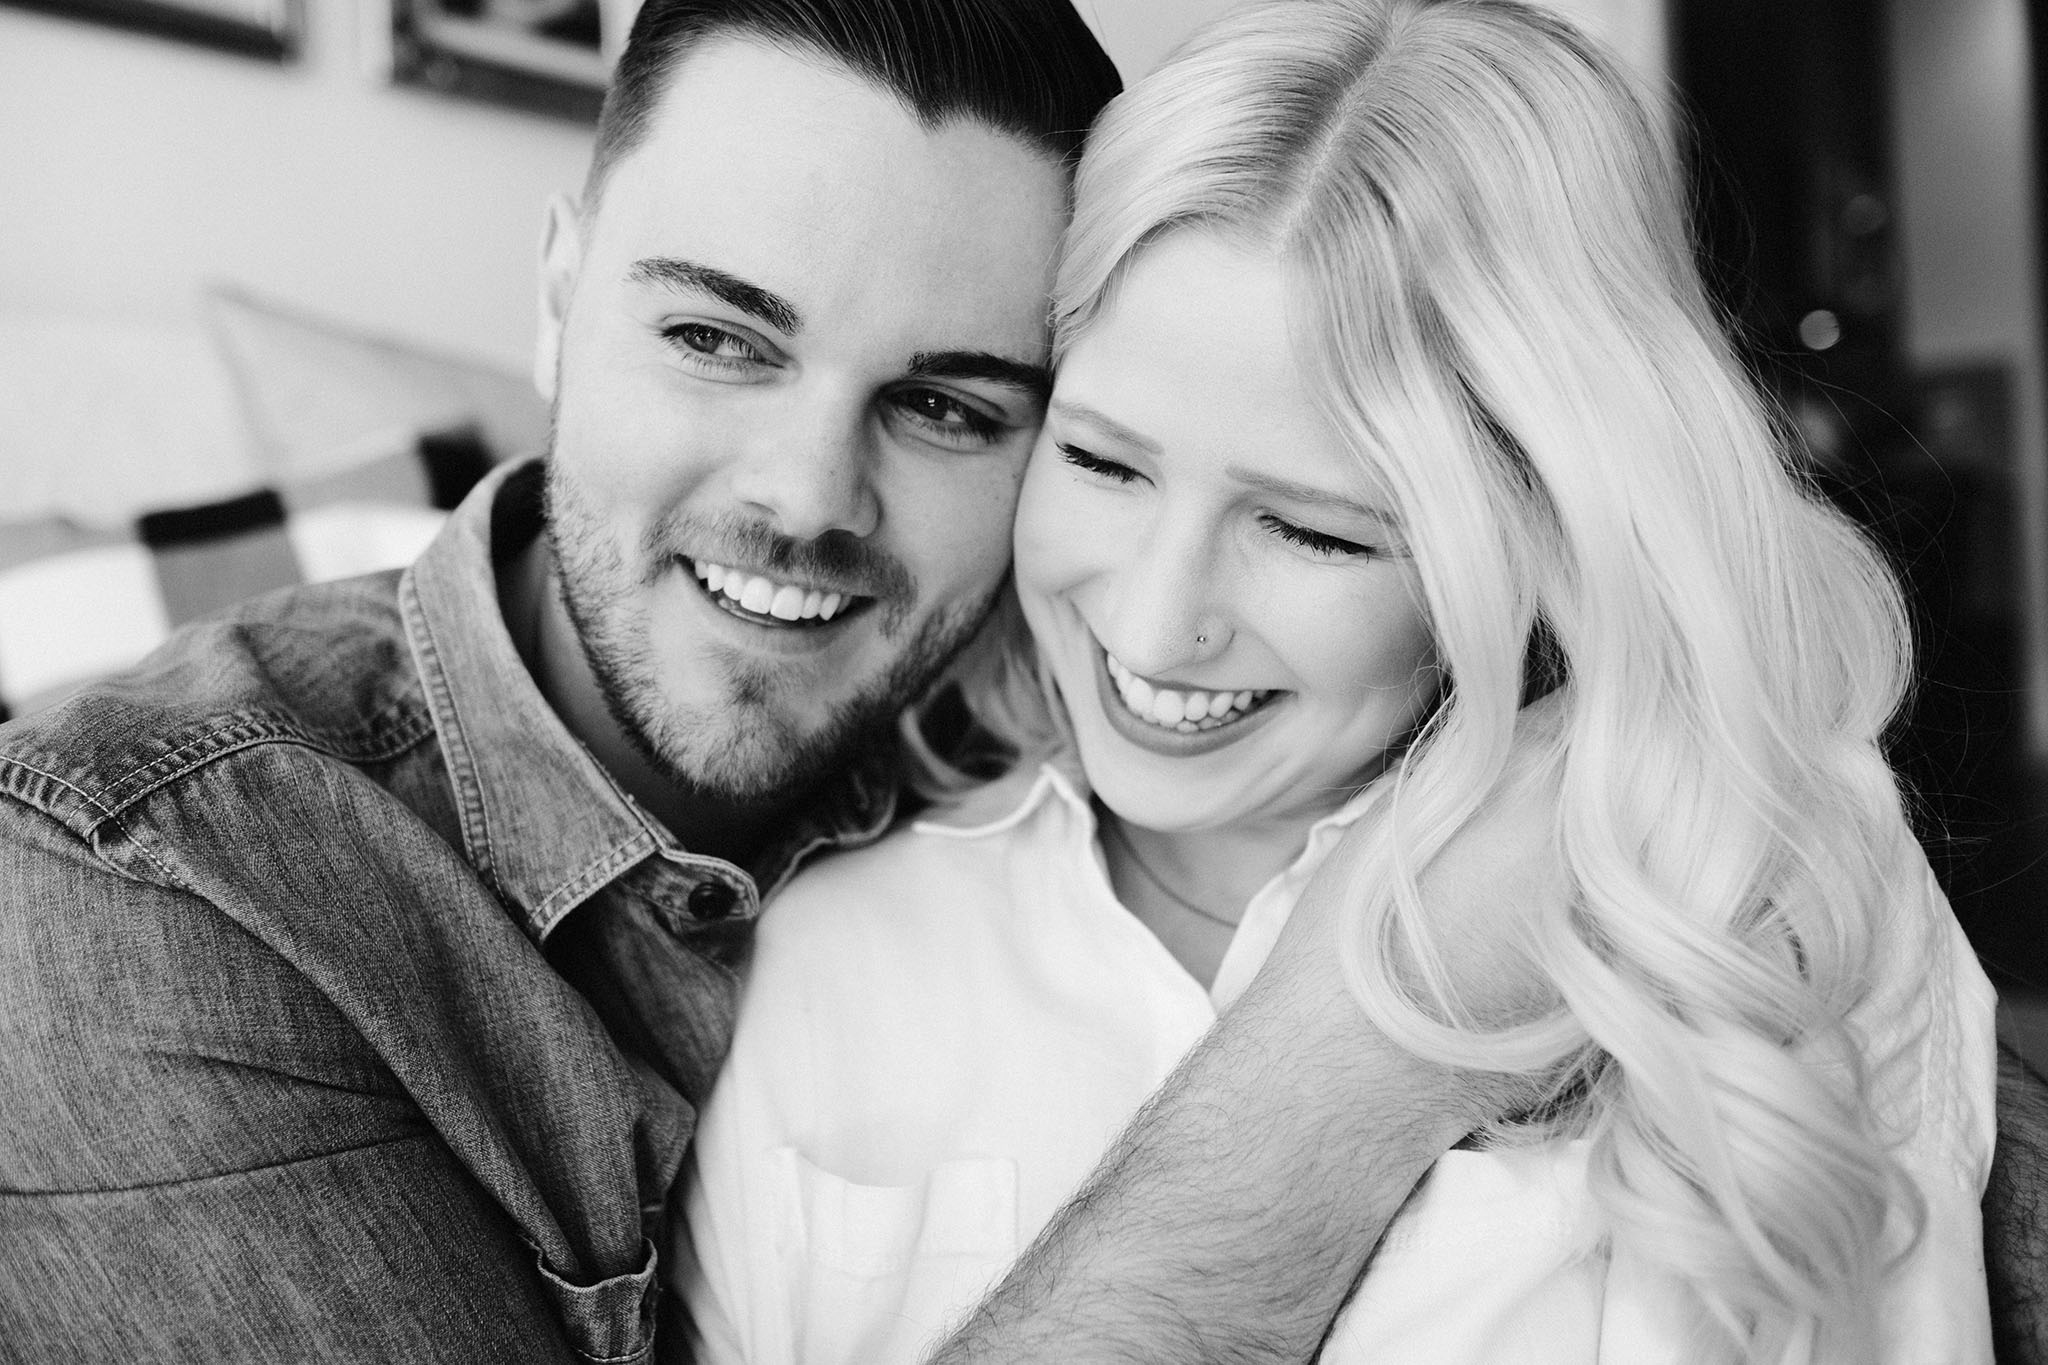 Arizona-in-home-session-wedding-photographer (23).jpg